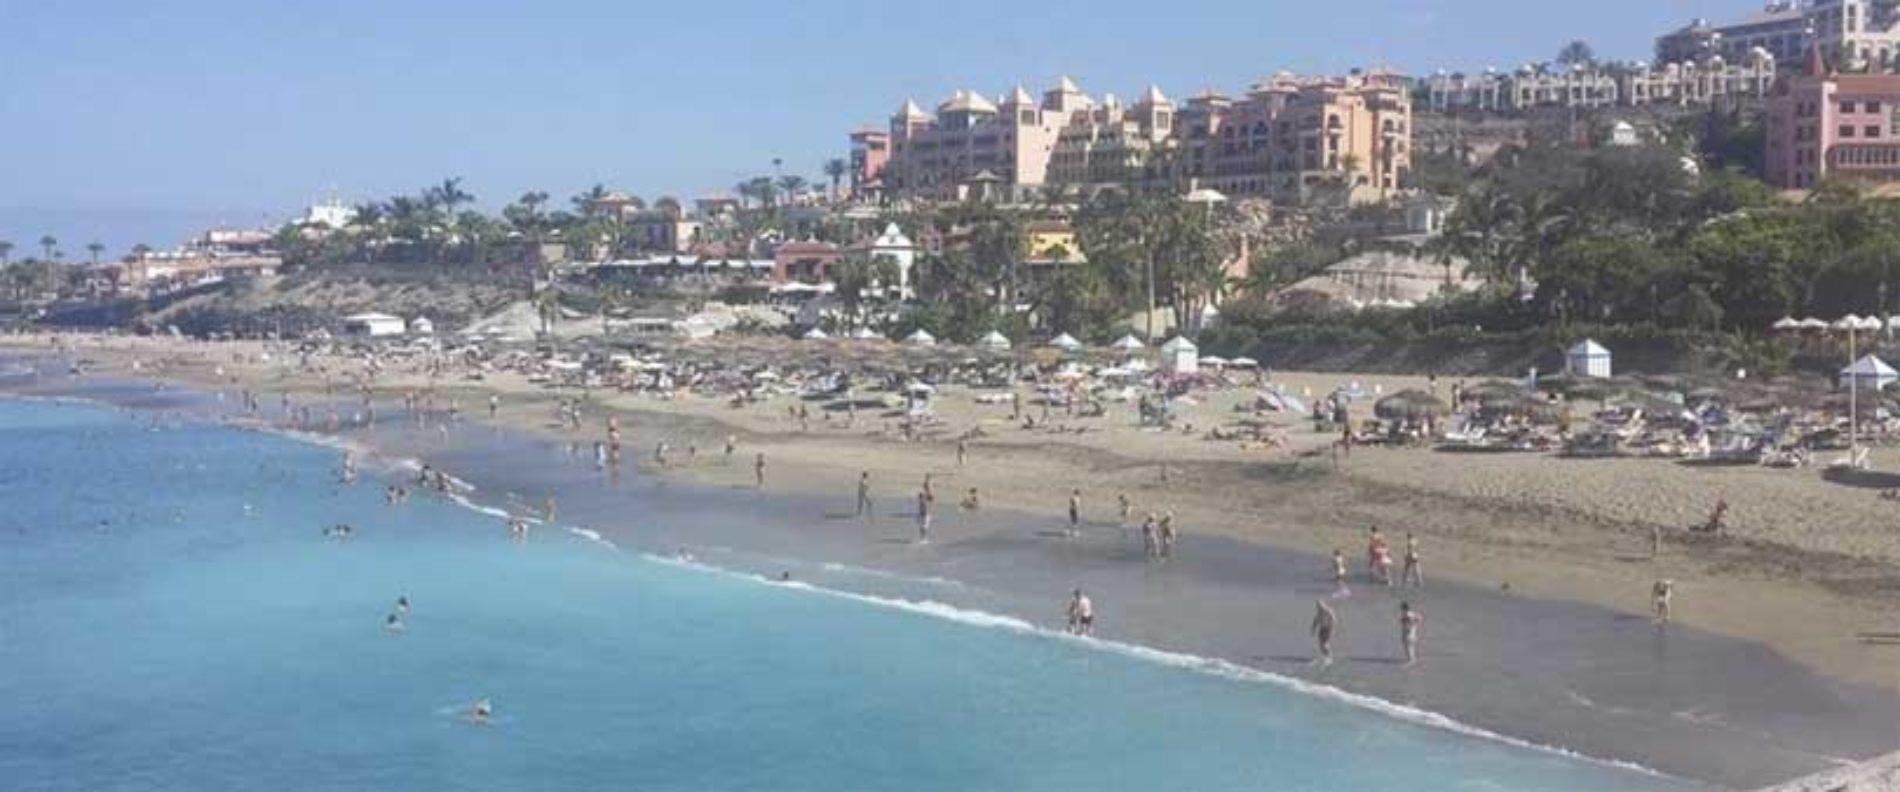 To mannlige turister druknet på Tenerife i går